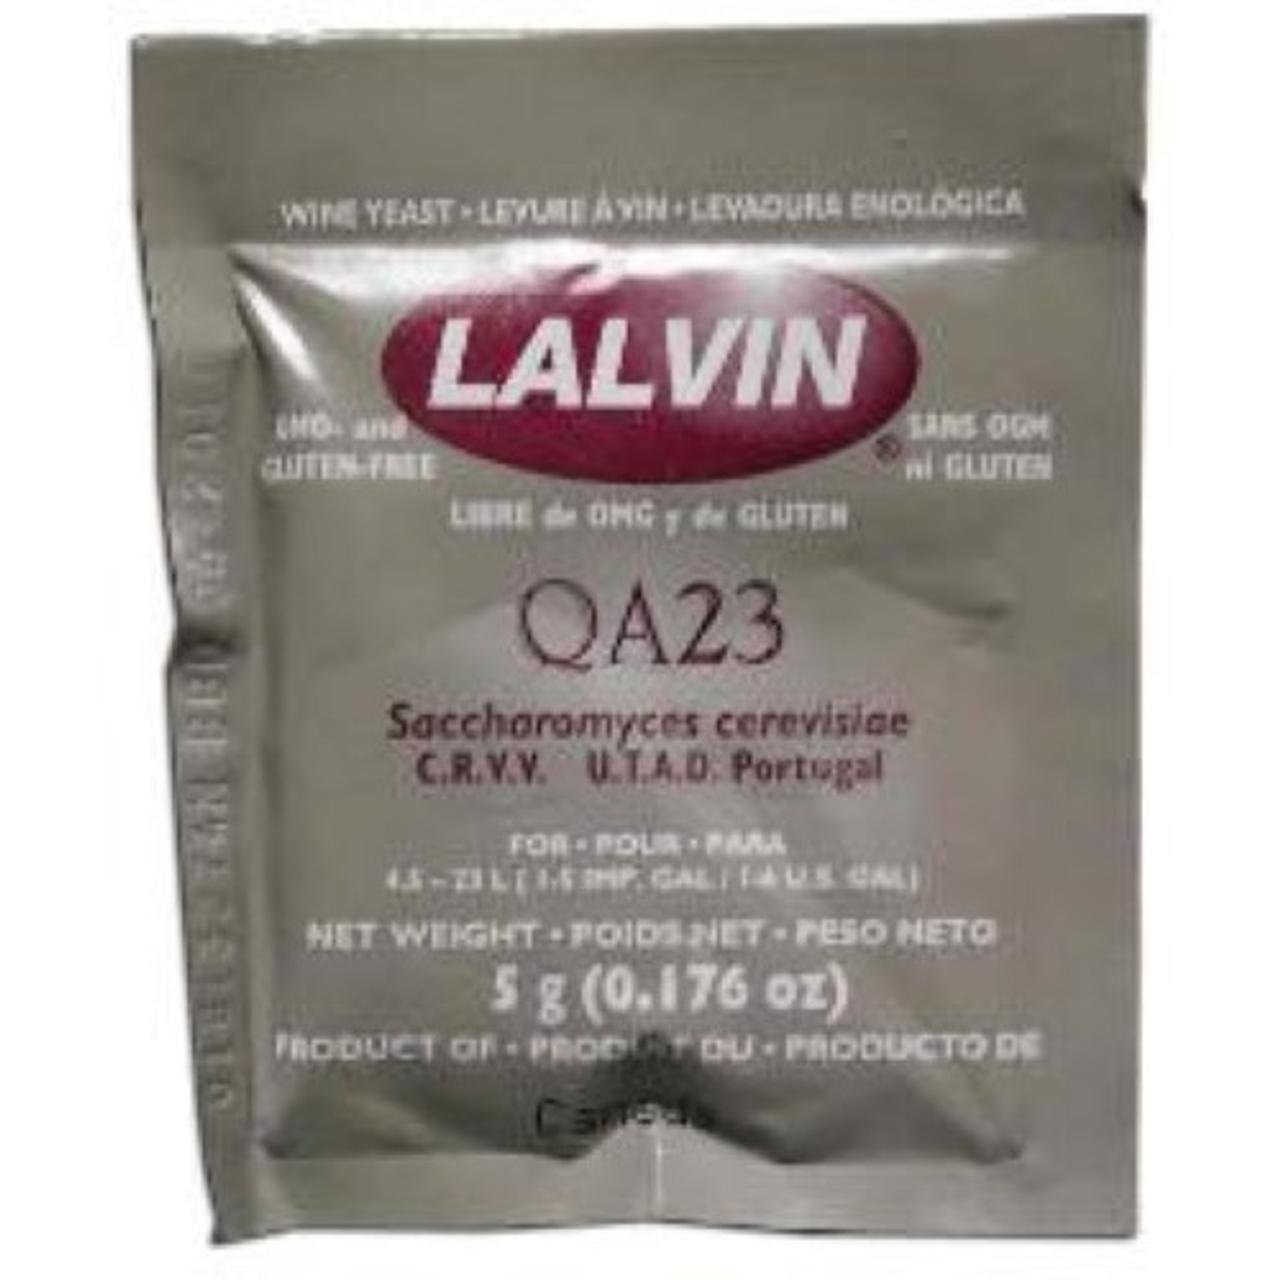 Lalvin Wine Yeast